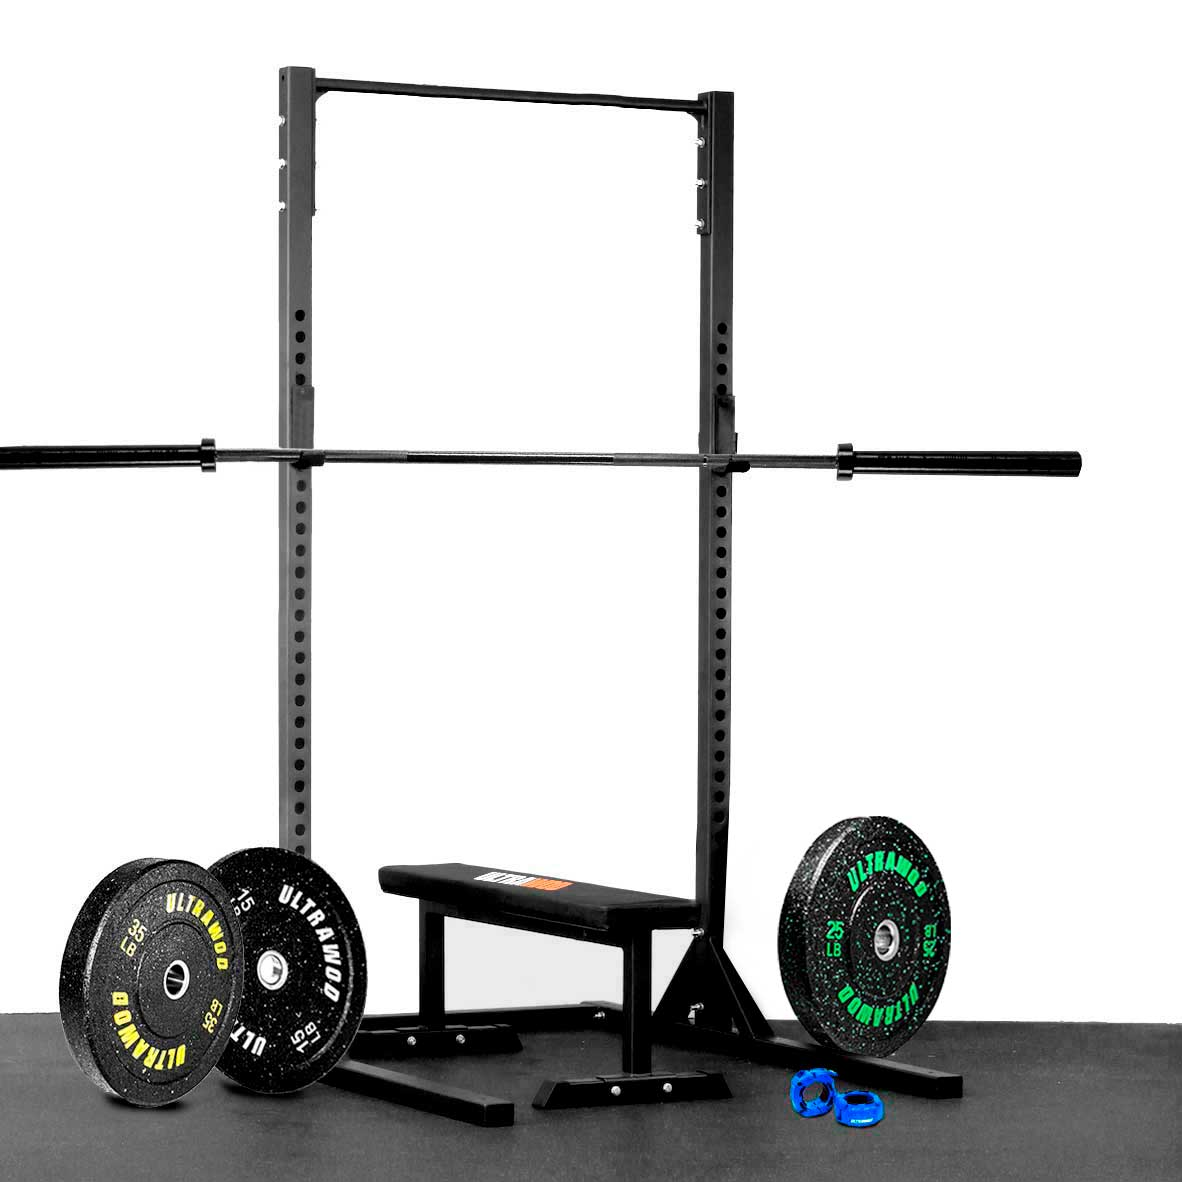 Kit para Treino em Casa Cross Training Performance UltraWod - 7 itens